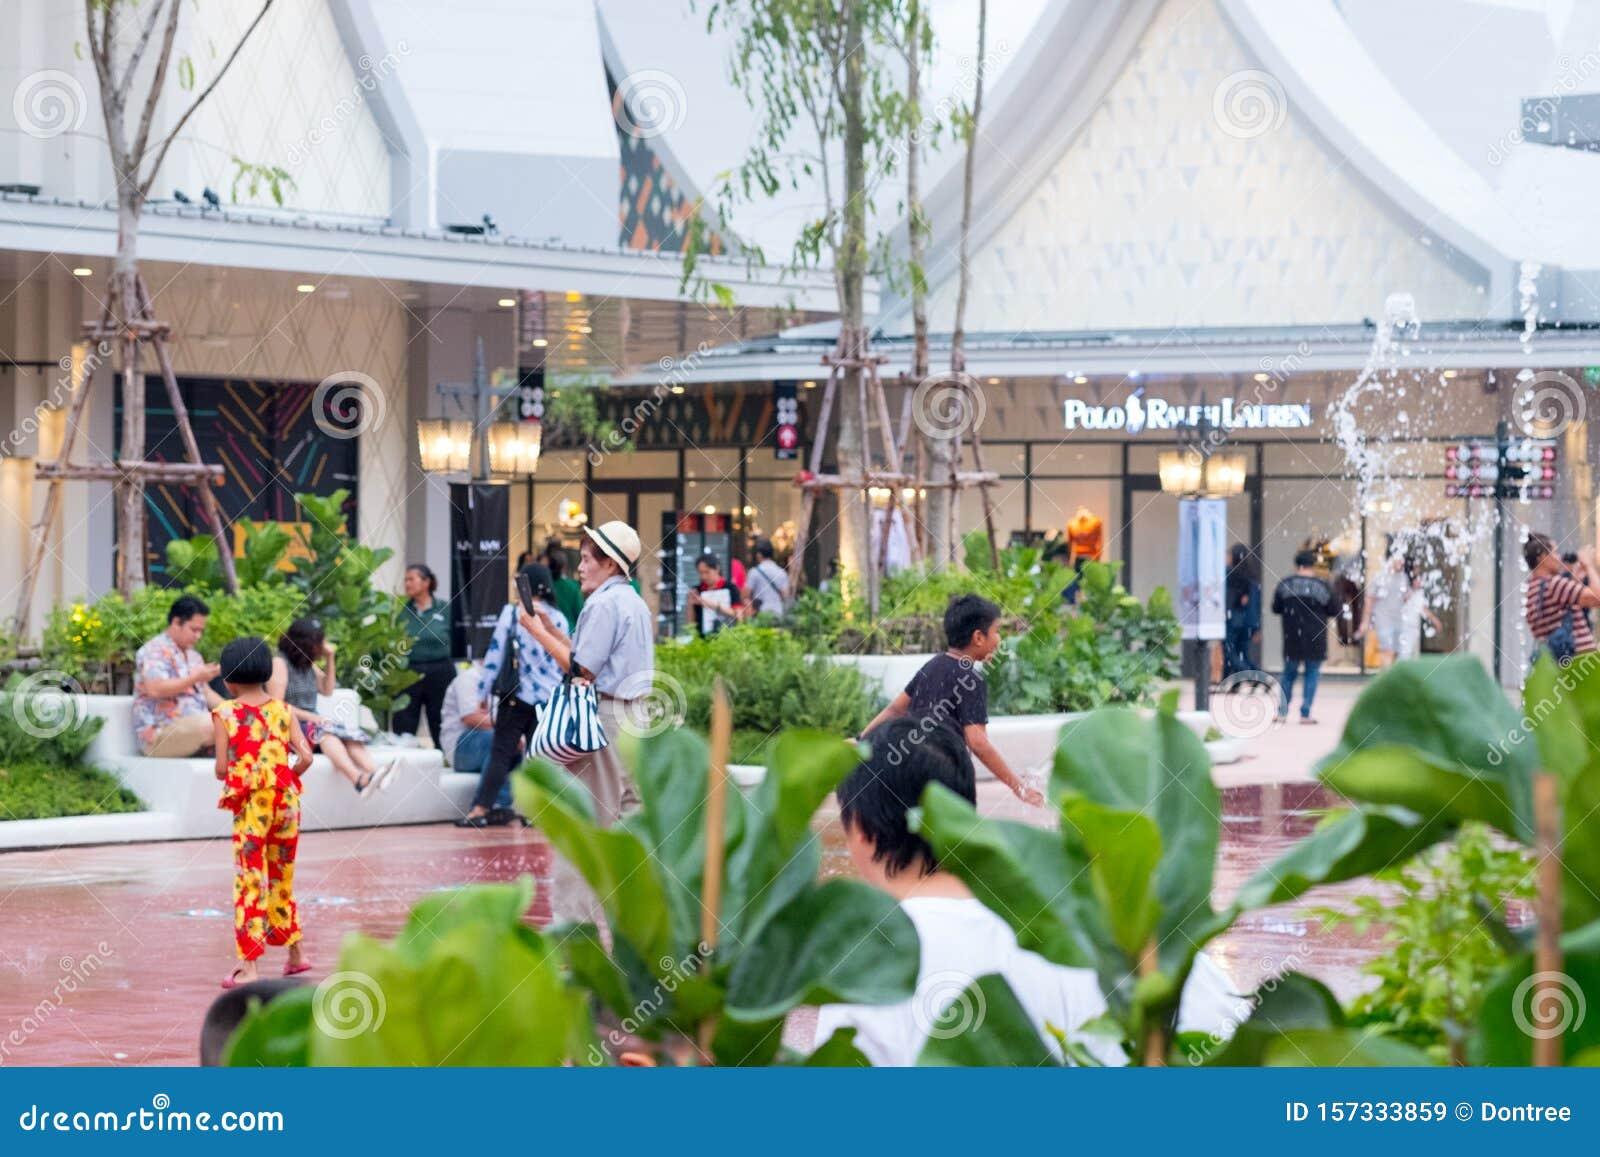 Samutprakarn, Thailand - August 31, 2019 : Central Village Bangkok Luxury Outlet is Thailand first international outlet shopping